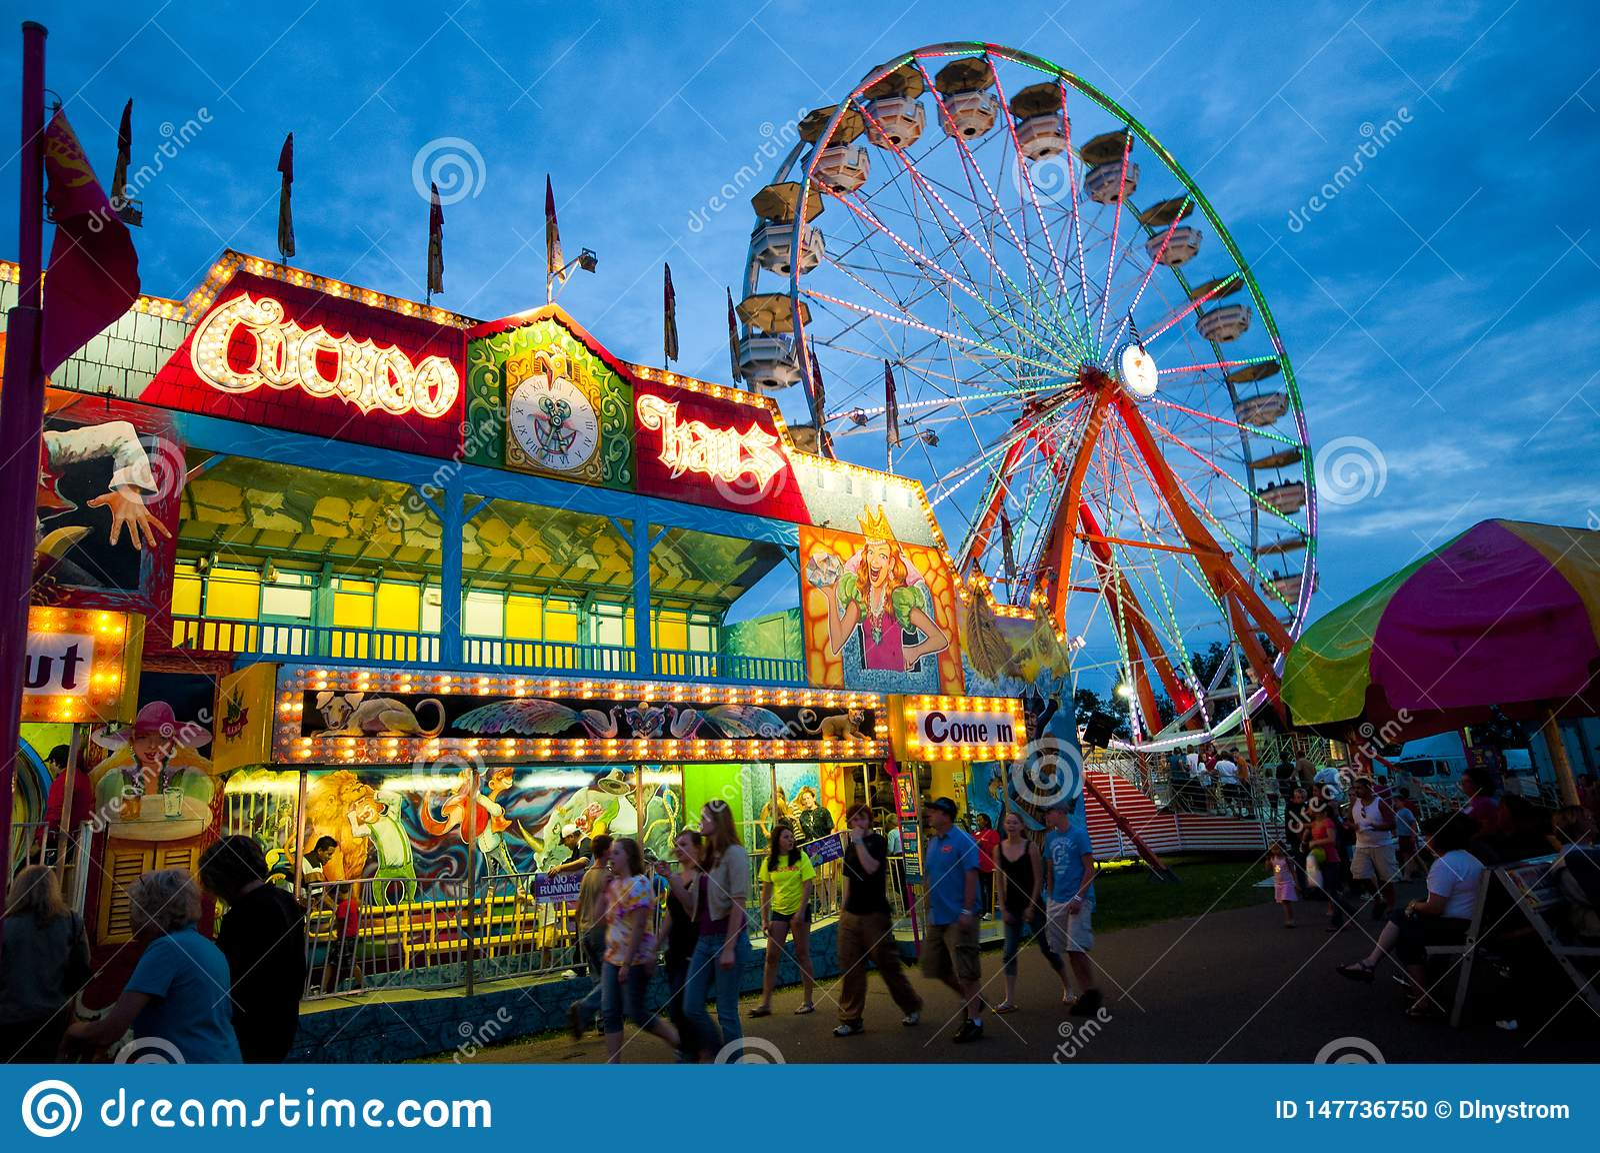 Carnaval et Ferris Wheel le soir